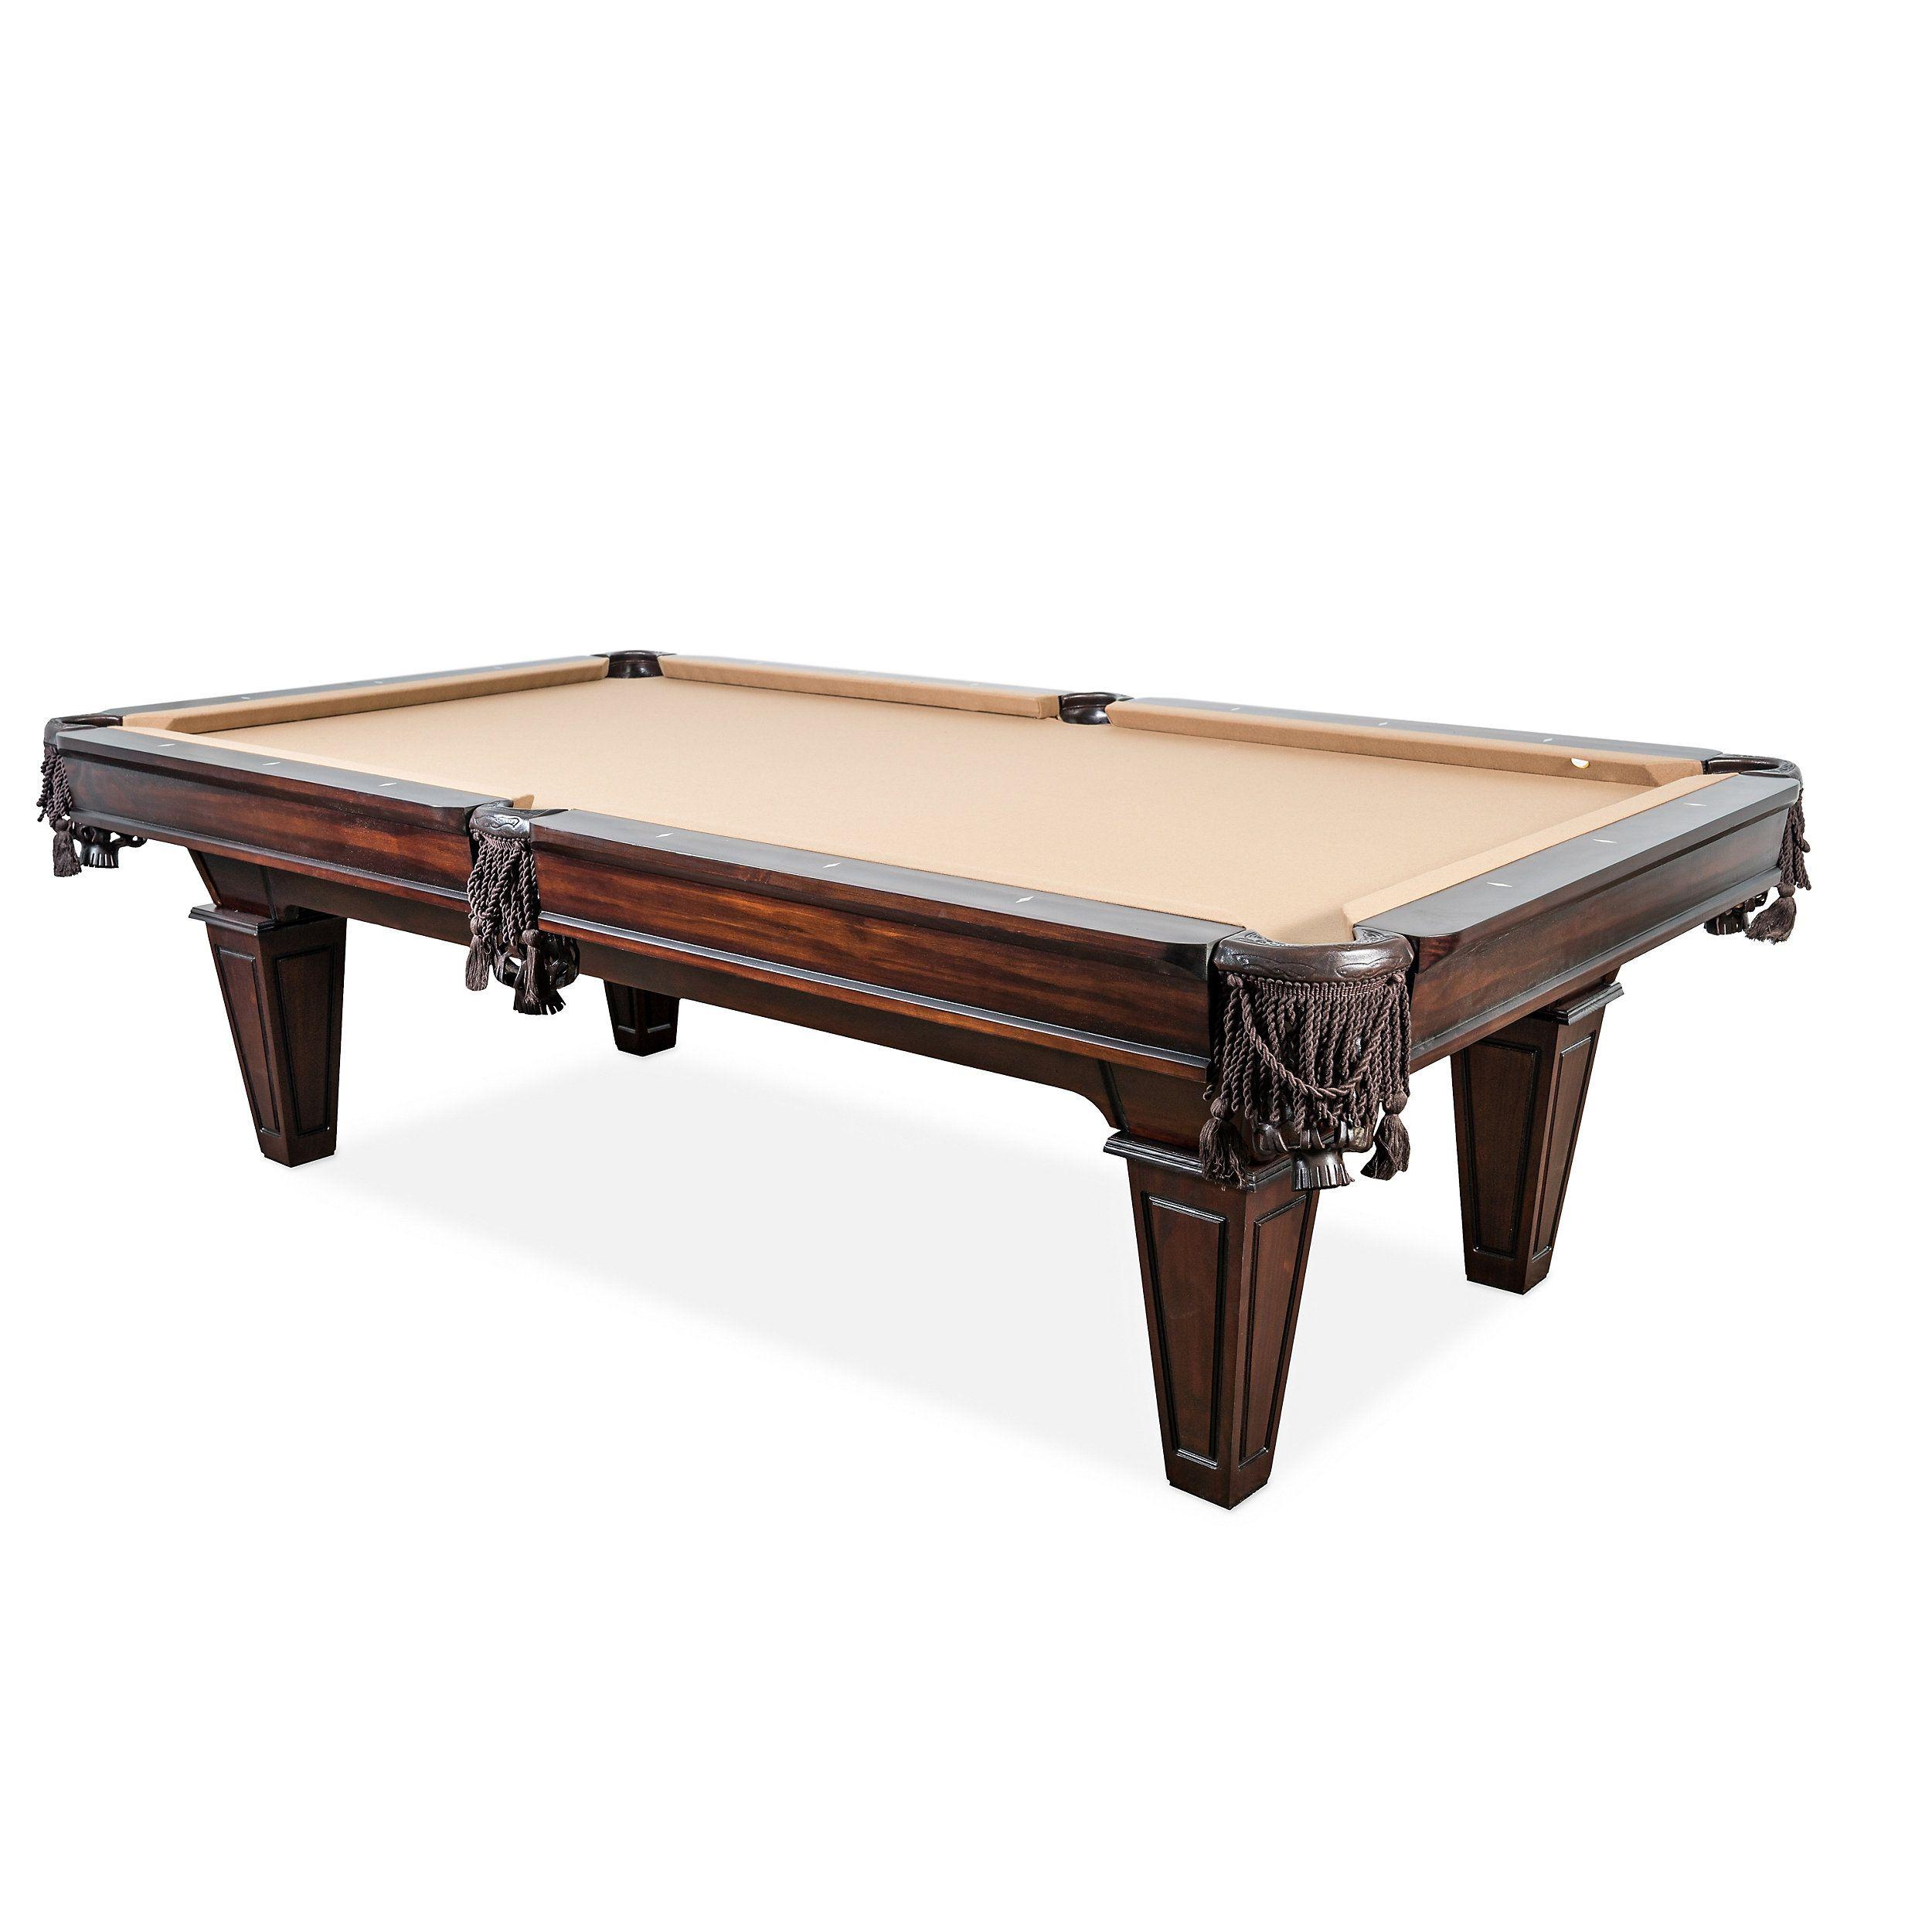 Adams Foot Custom Billiards Table The Adams Foot Pool Table Is A - Claw foot pool table